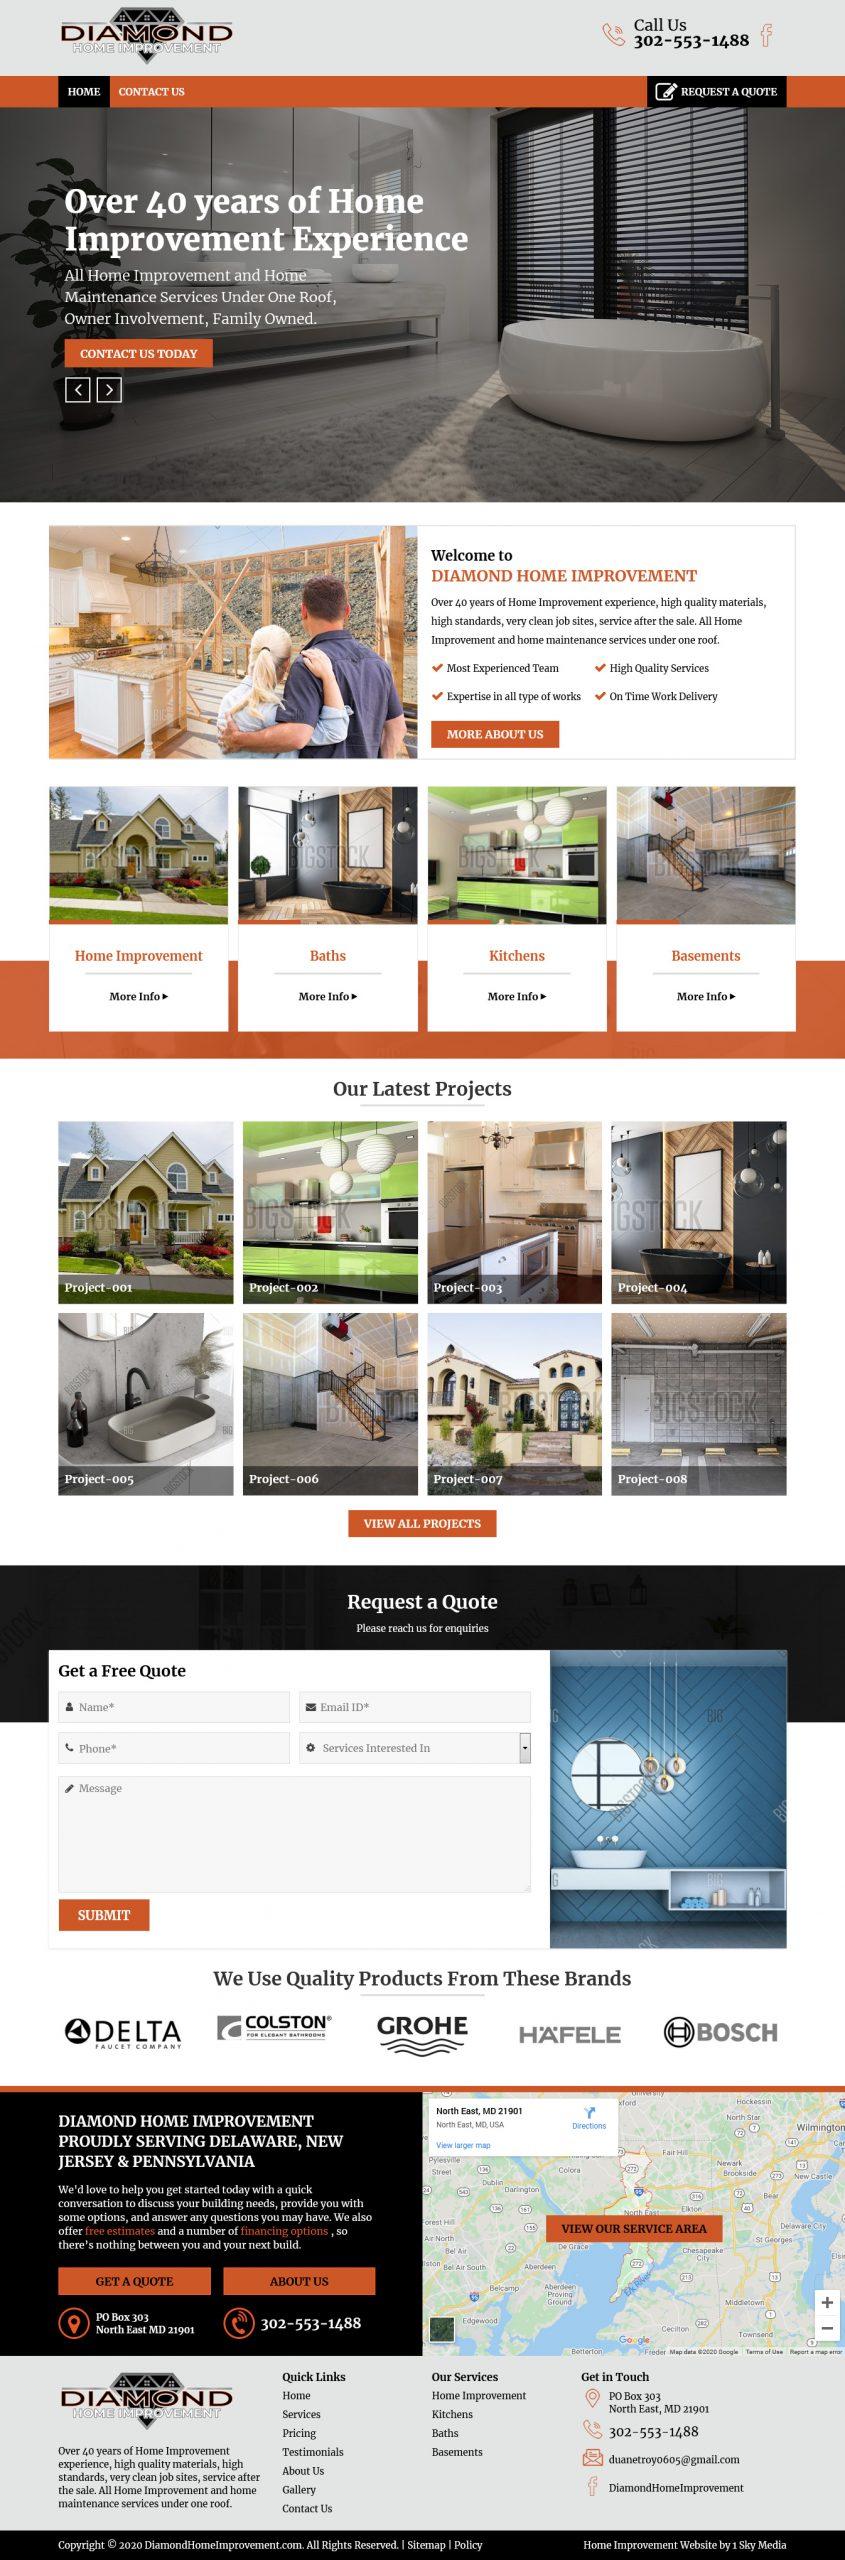 Diamond Home Improvement Website Design